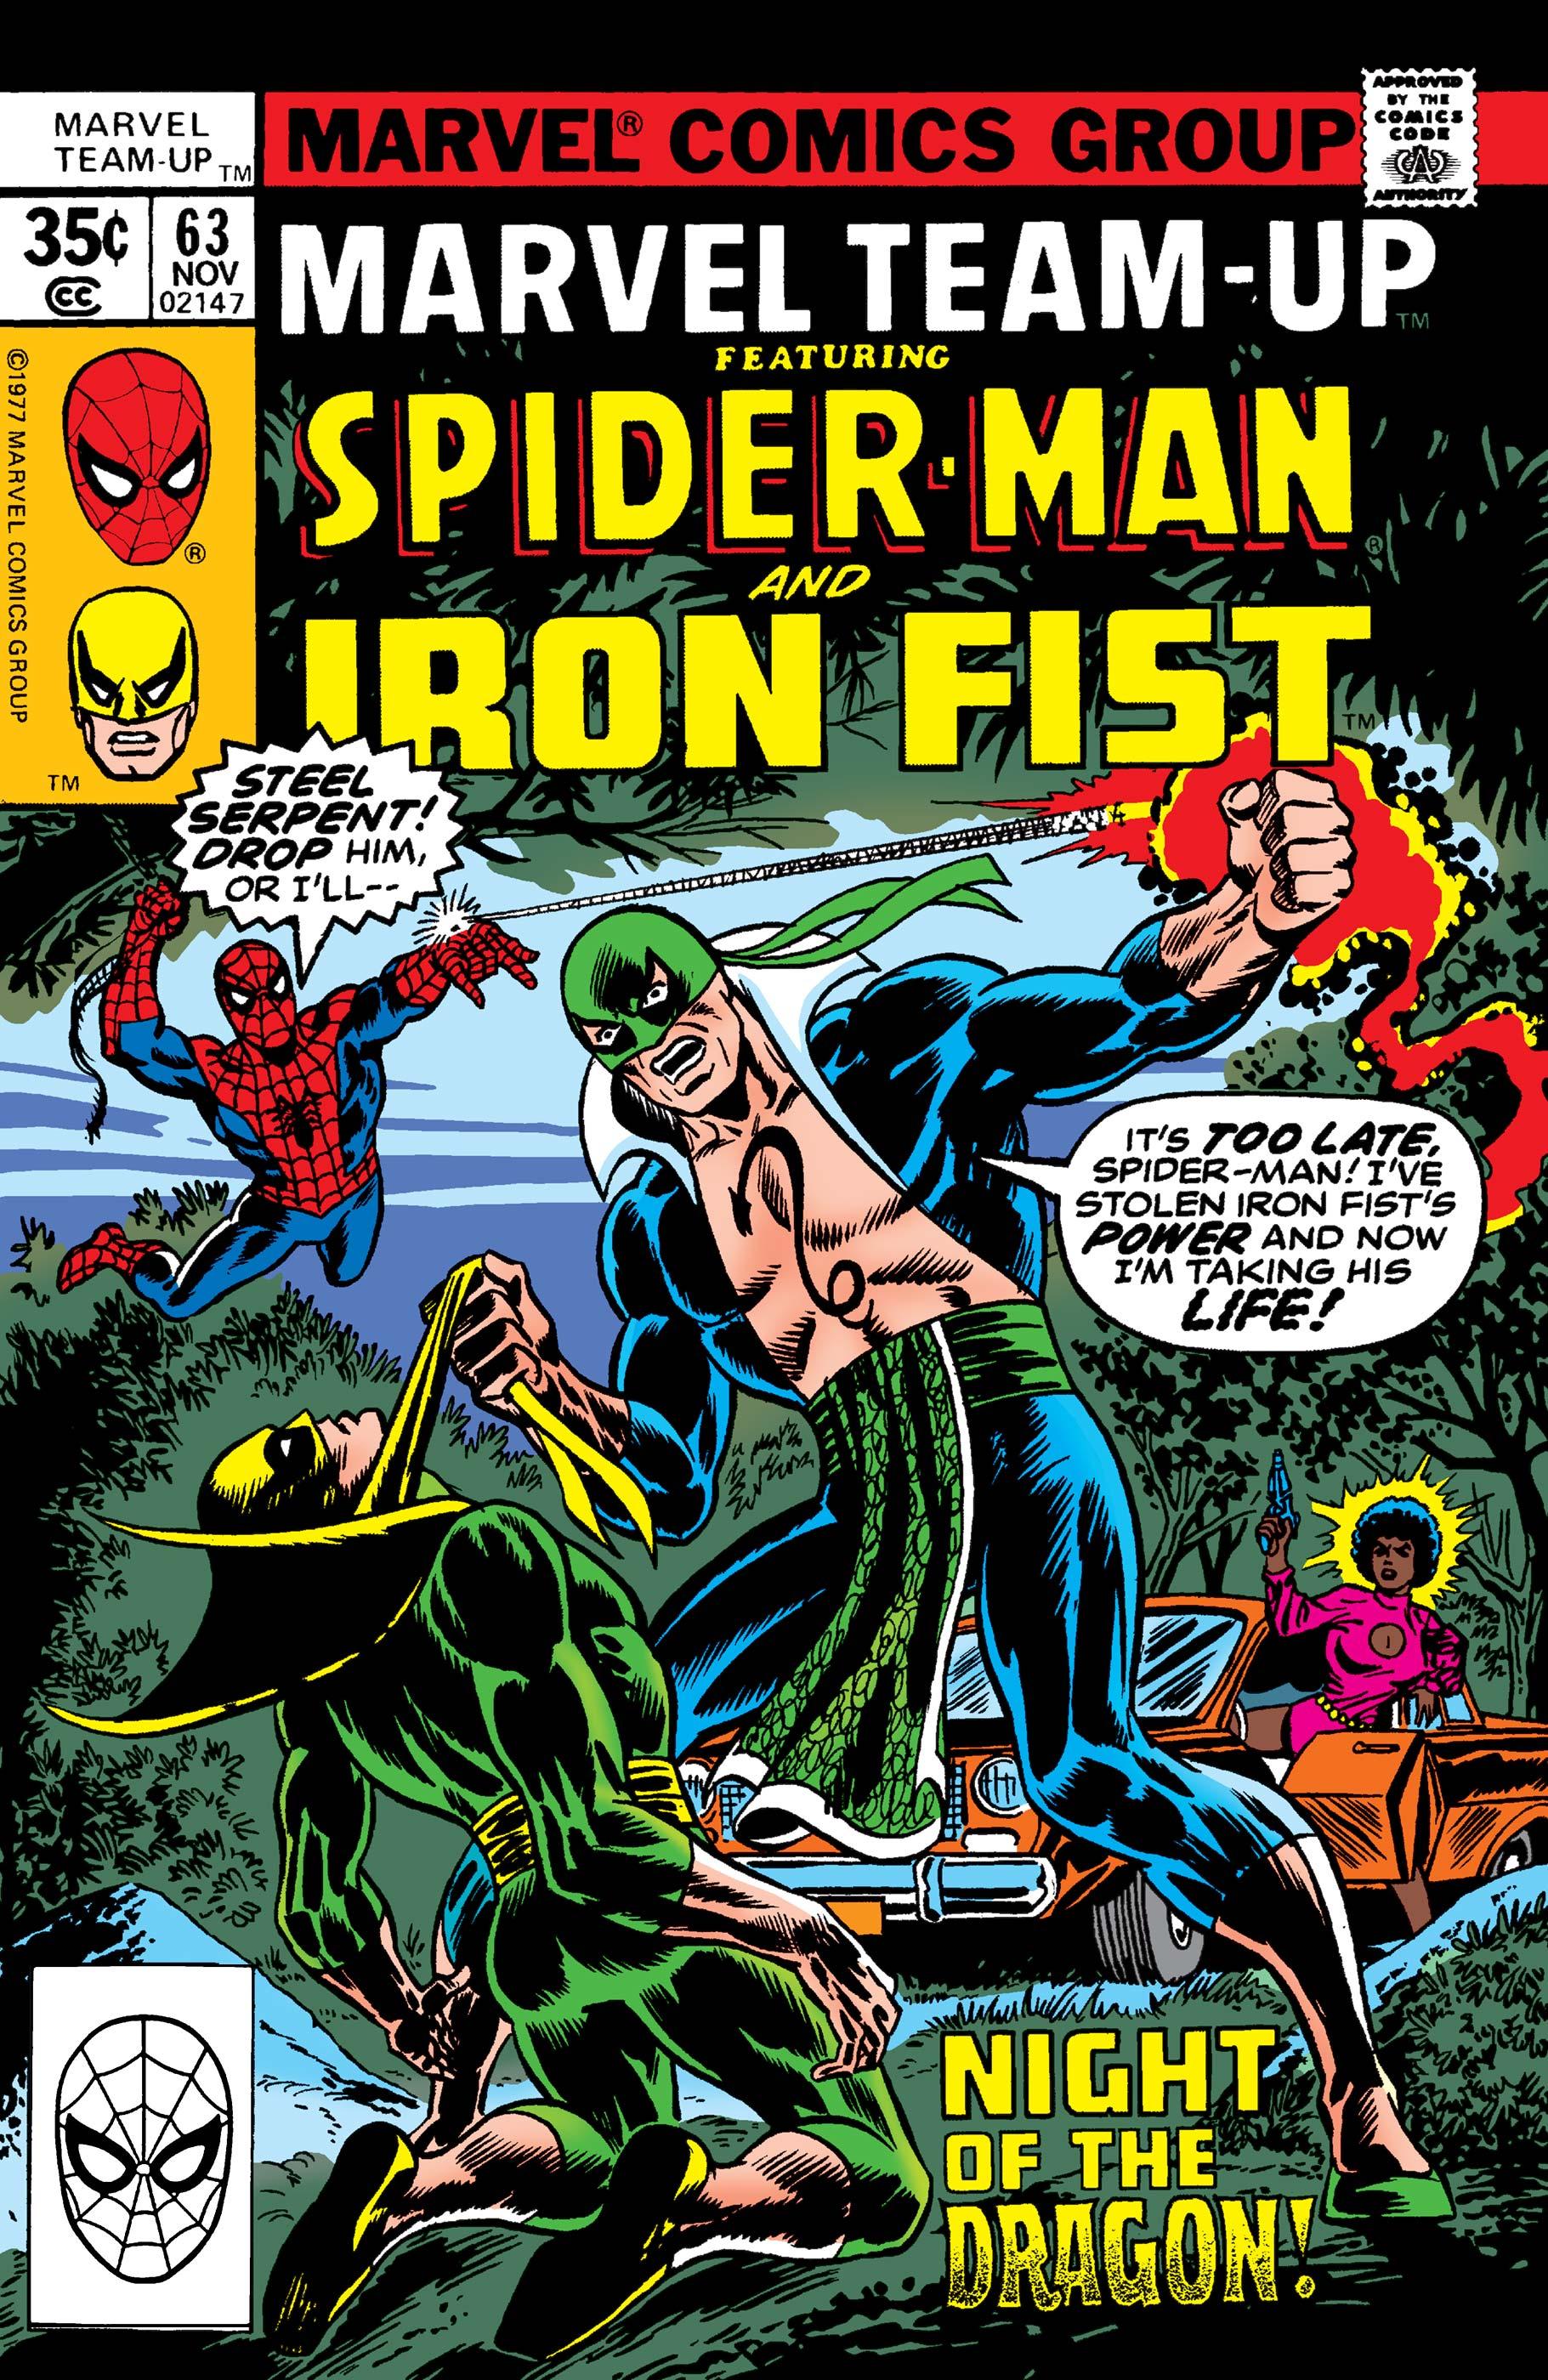 Marvel Team-Up (1972) #63